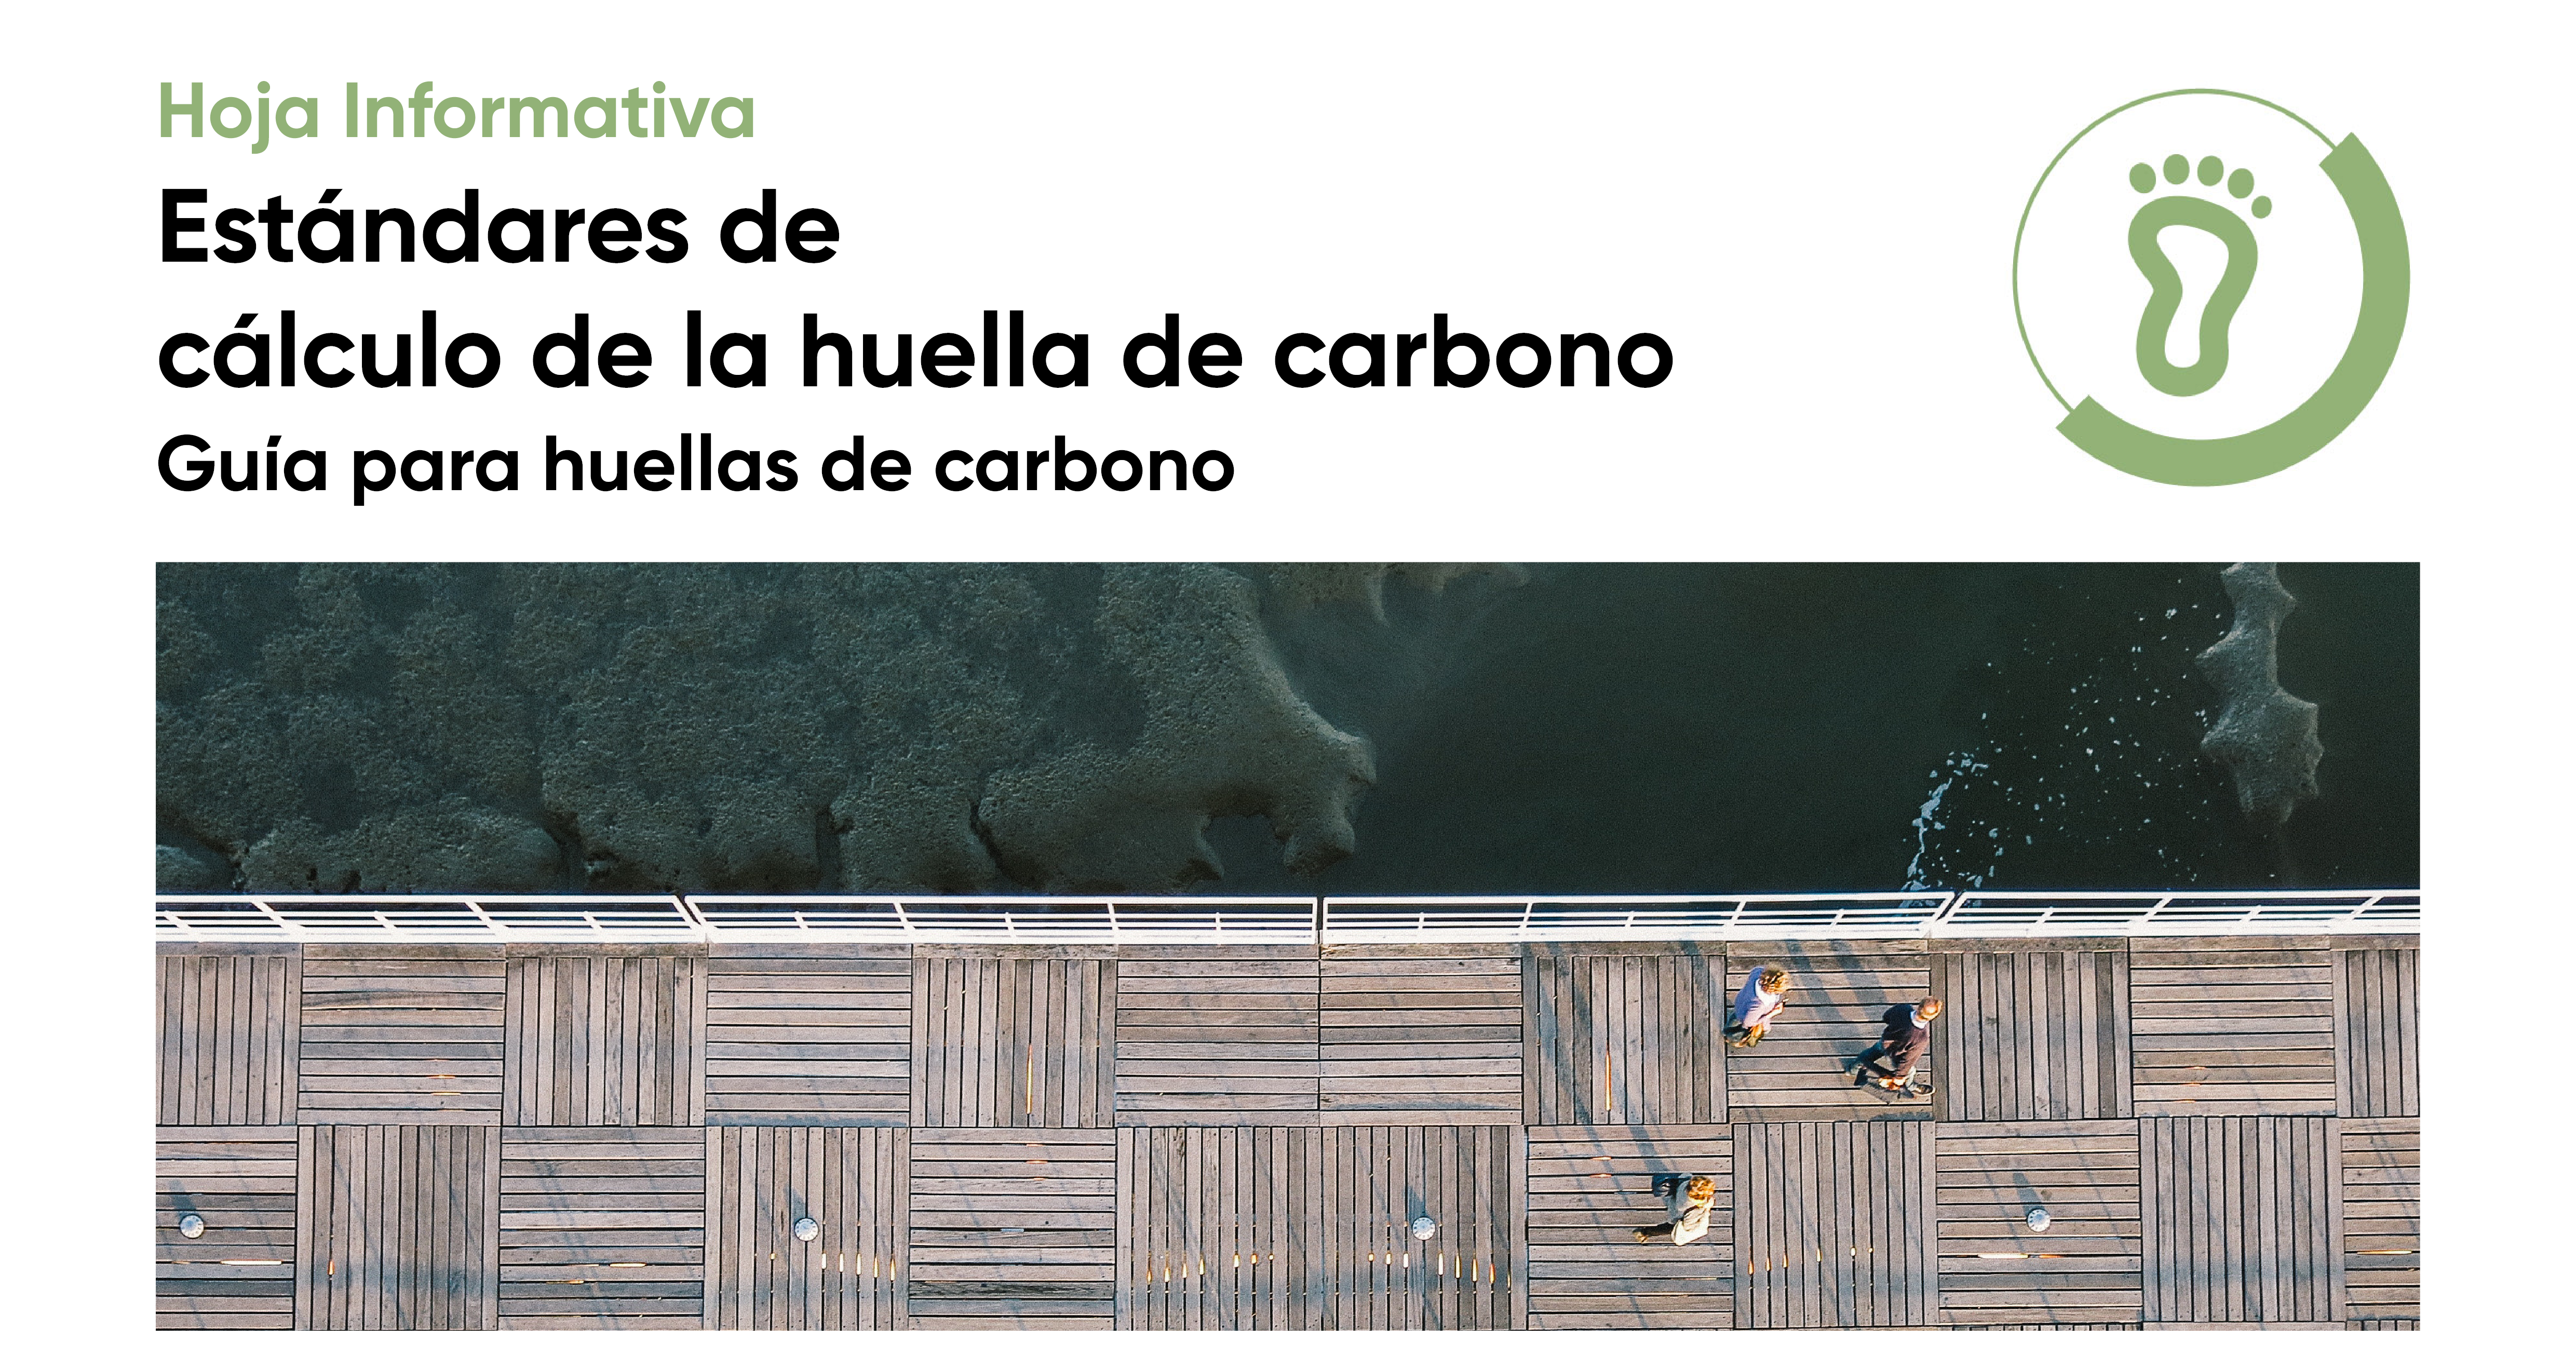 Carbon footprint image - ESP